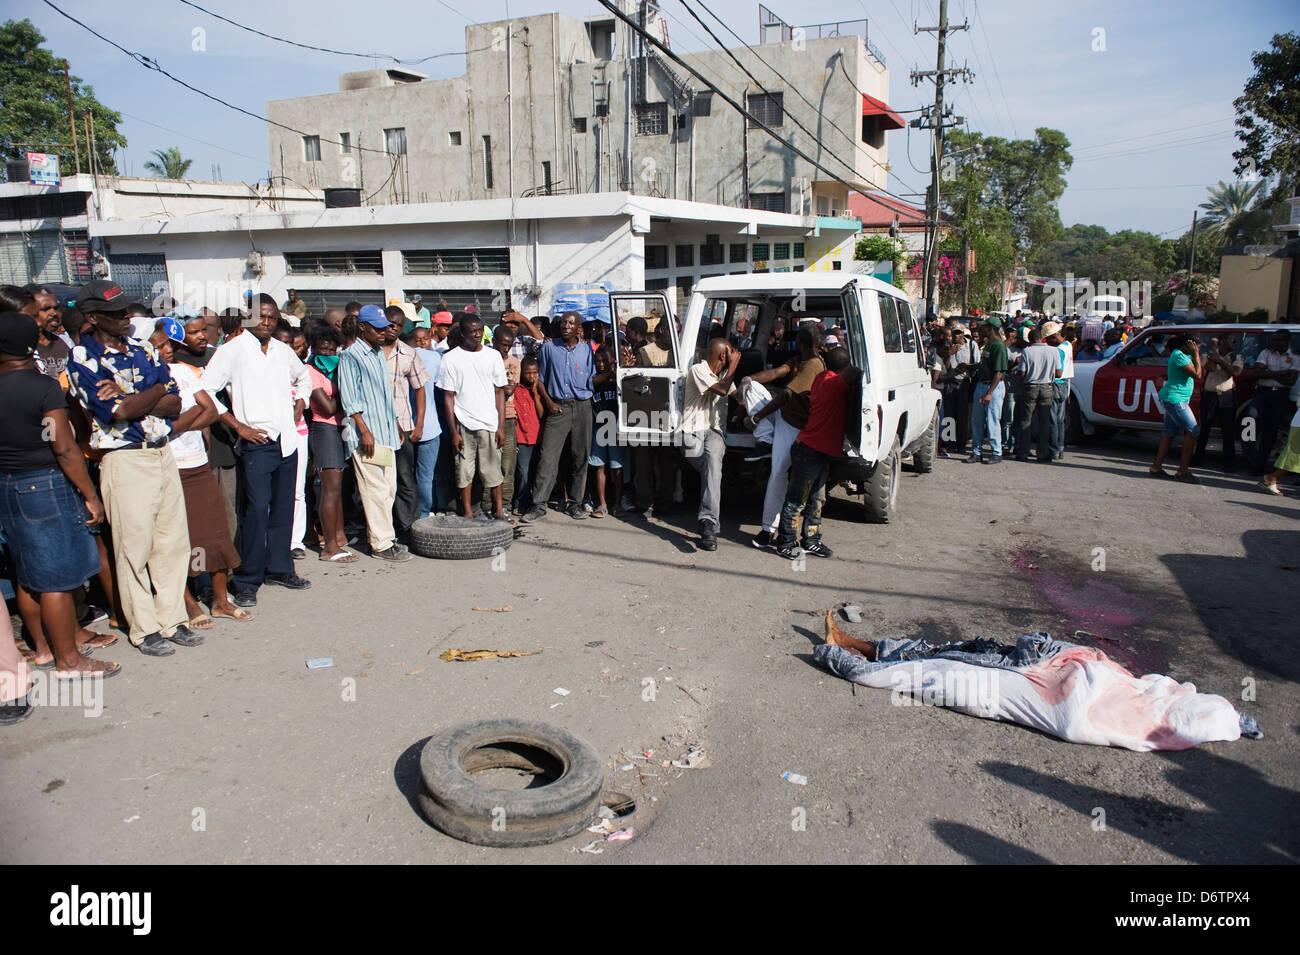 hit and run victim, January 2010 earthquake, Port au Prince, Haiti, Caribbean - Stock Image